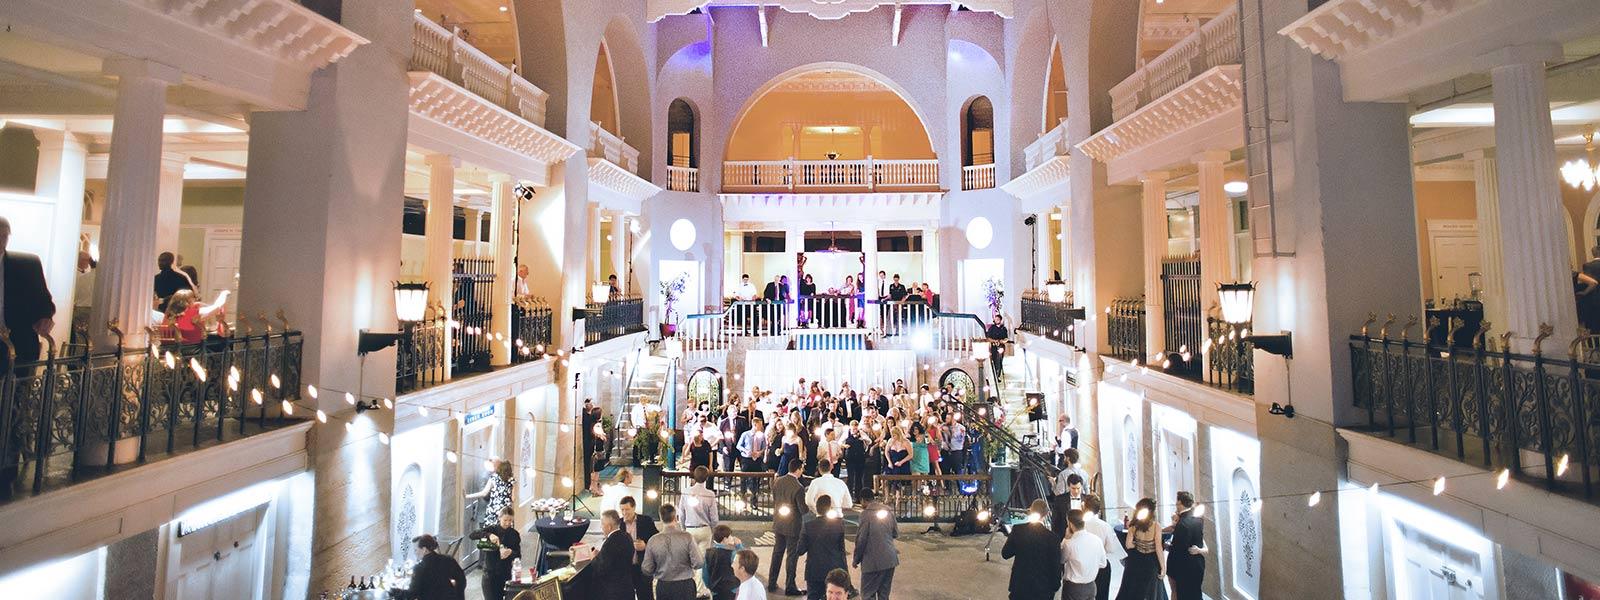 Lightner Museum Wedding Venue